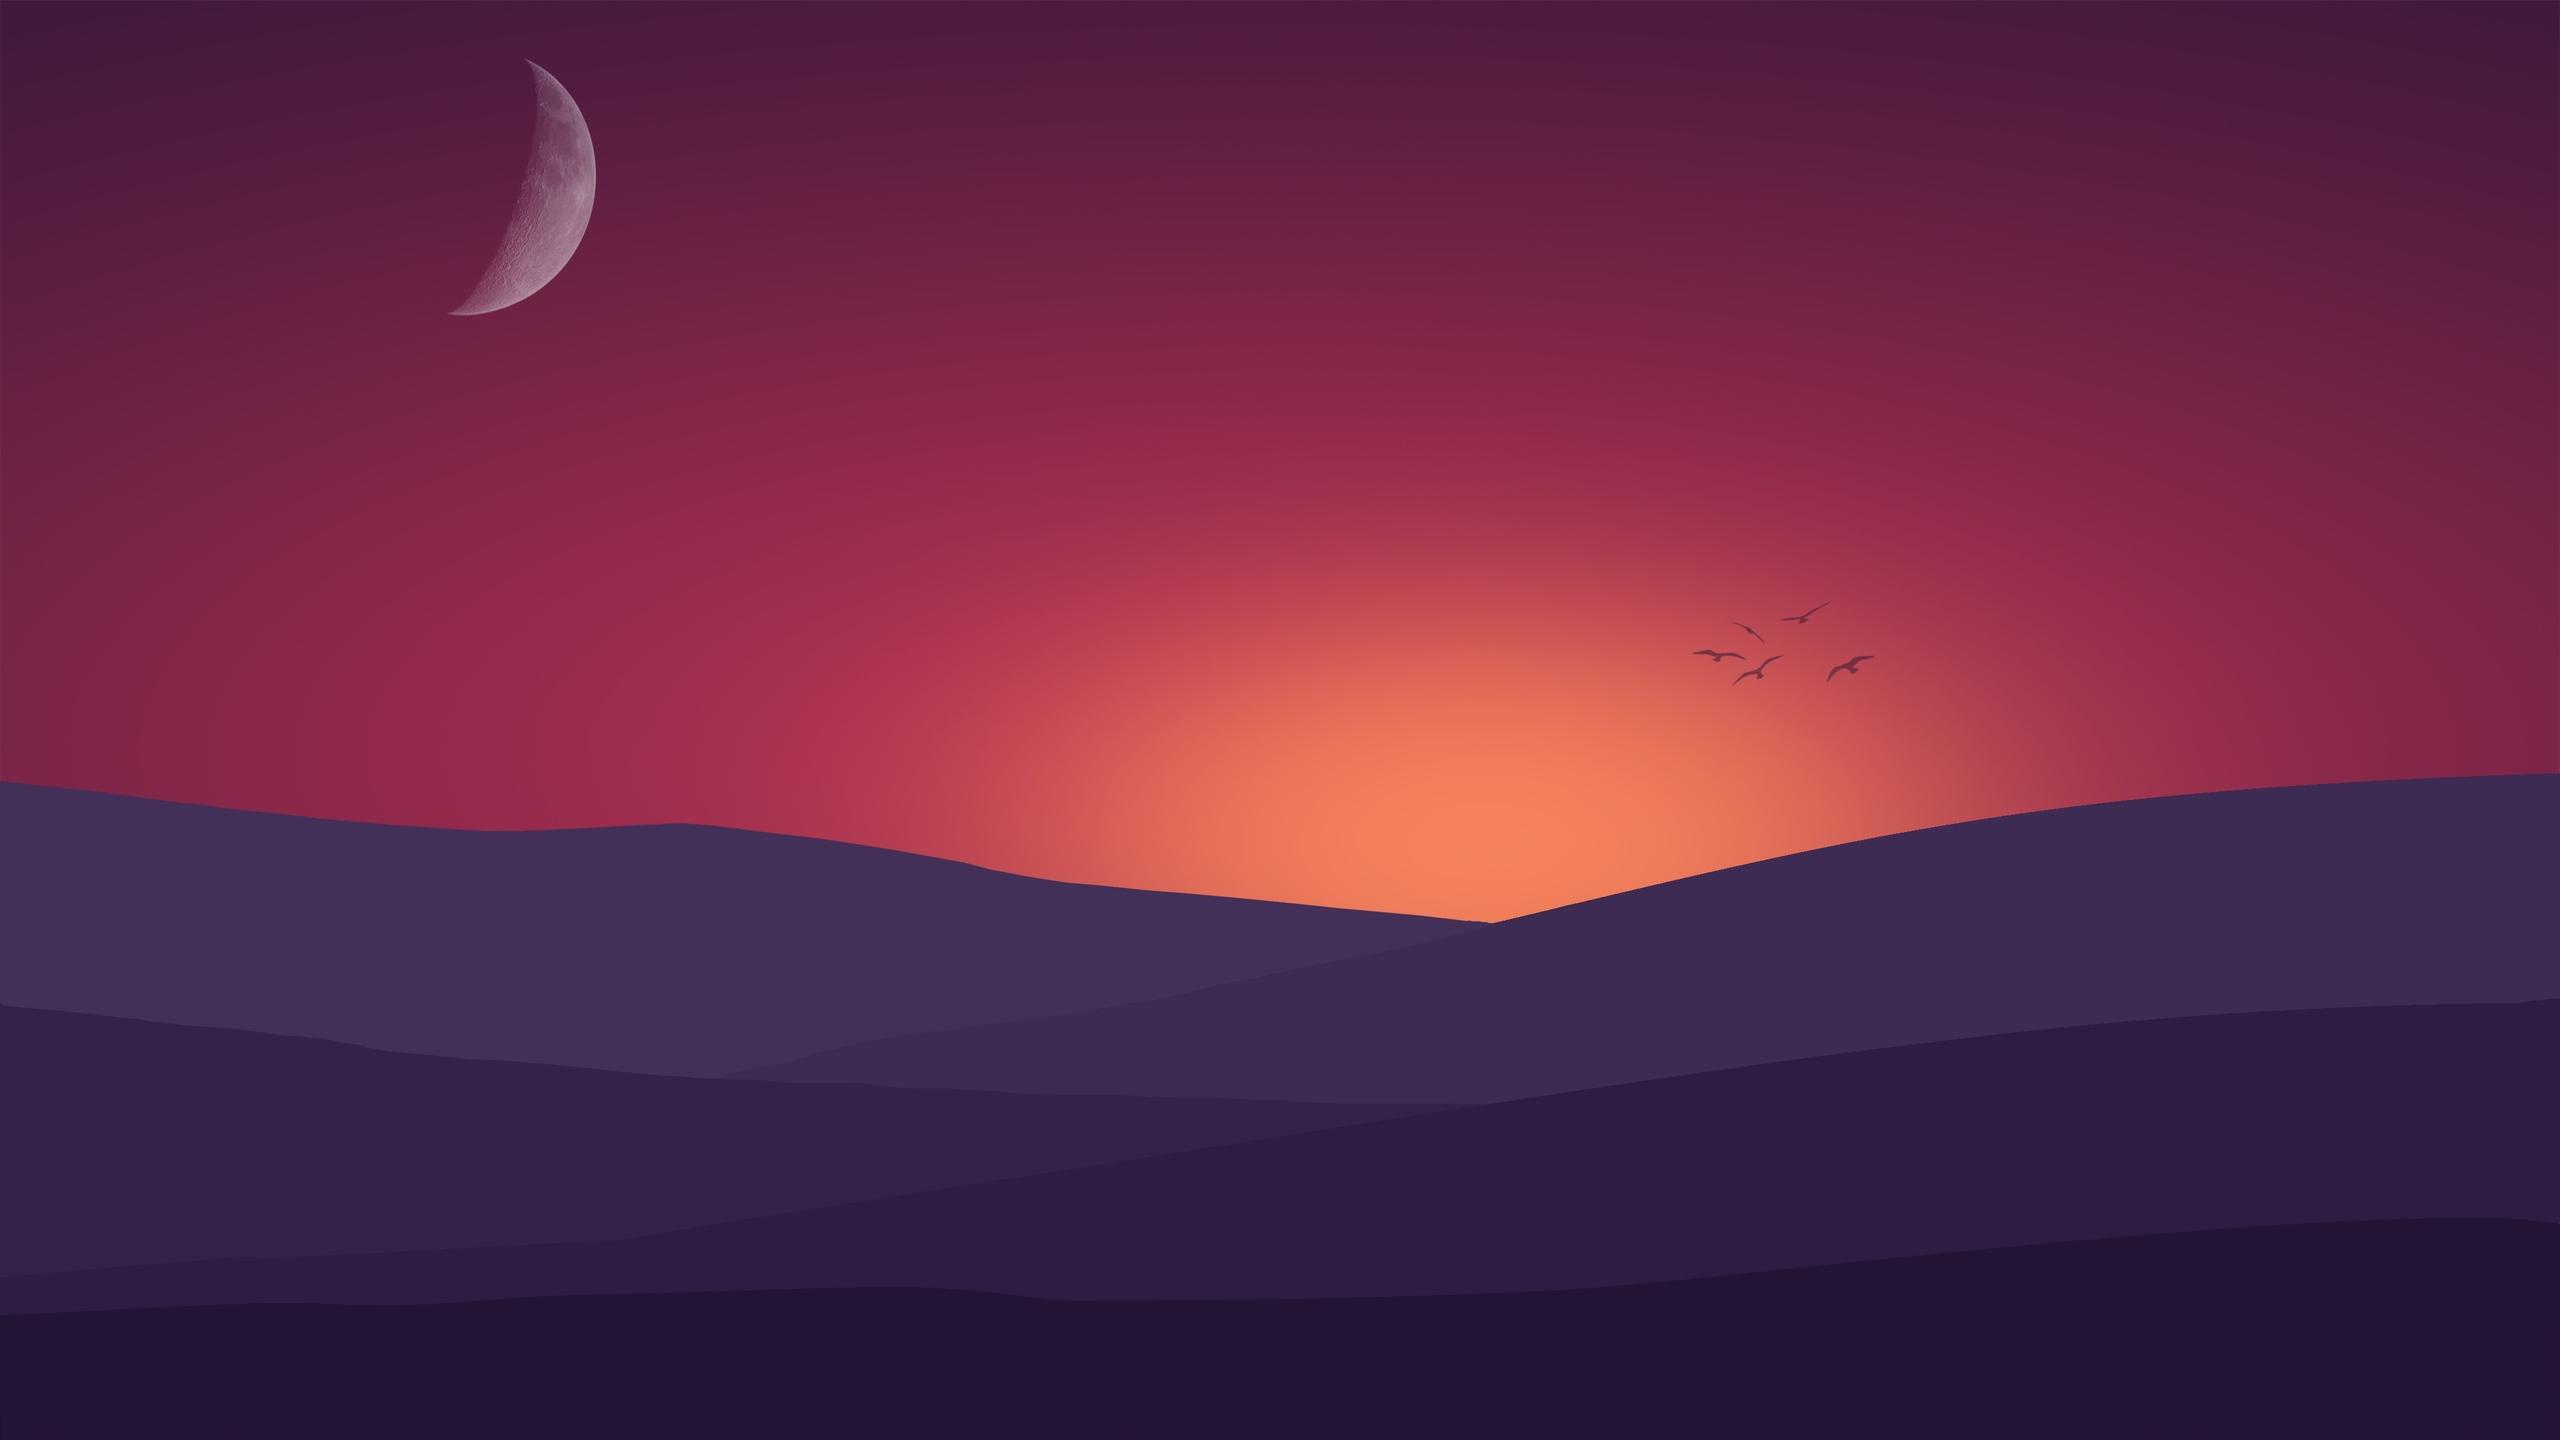 birds-flying-towards-sunset-landscape-minimalist-4k-et.jpg